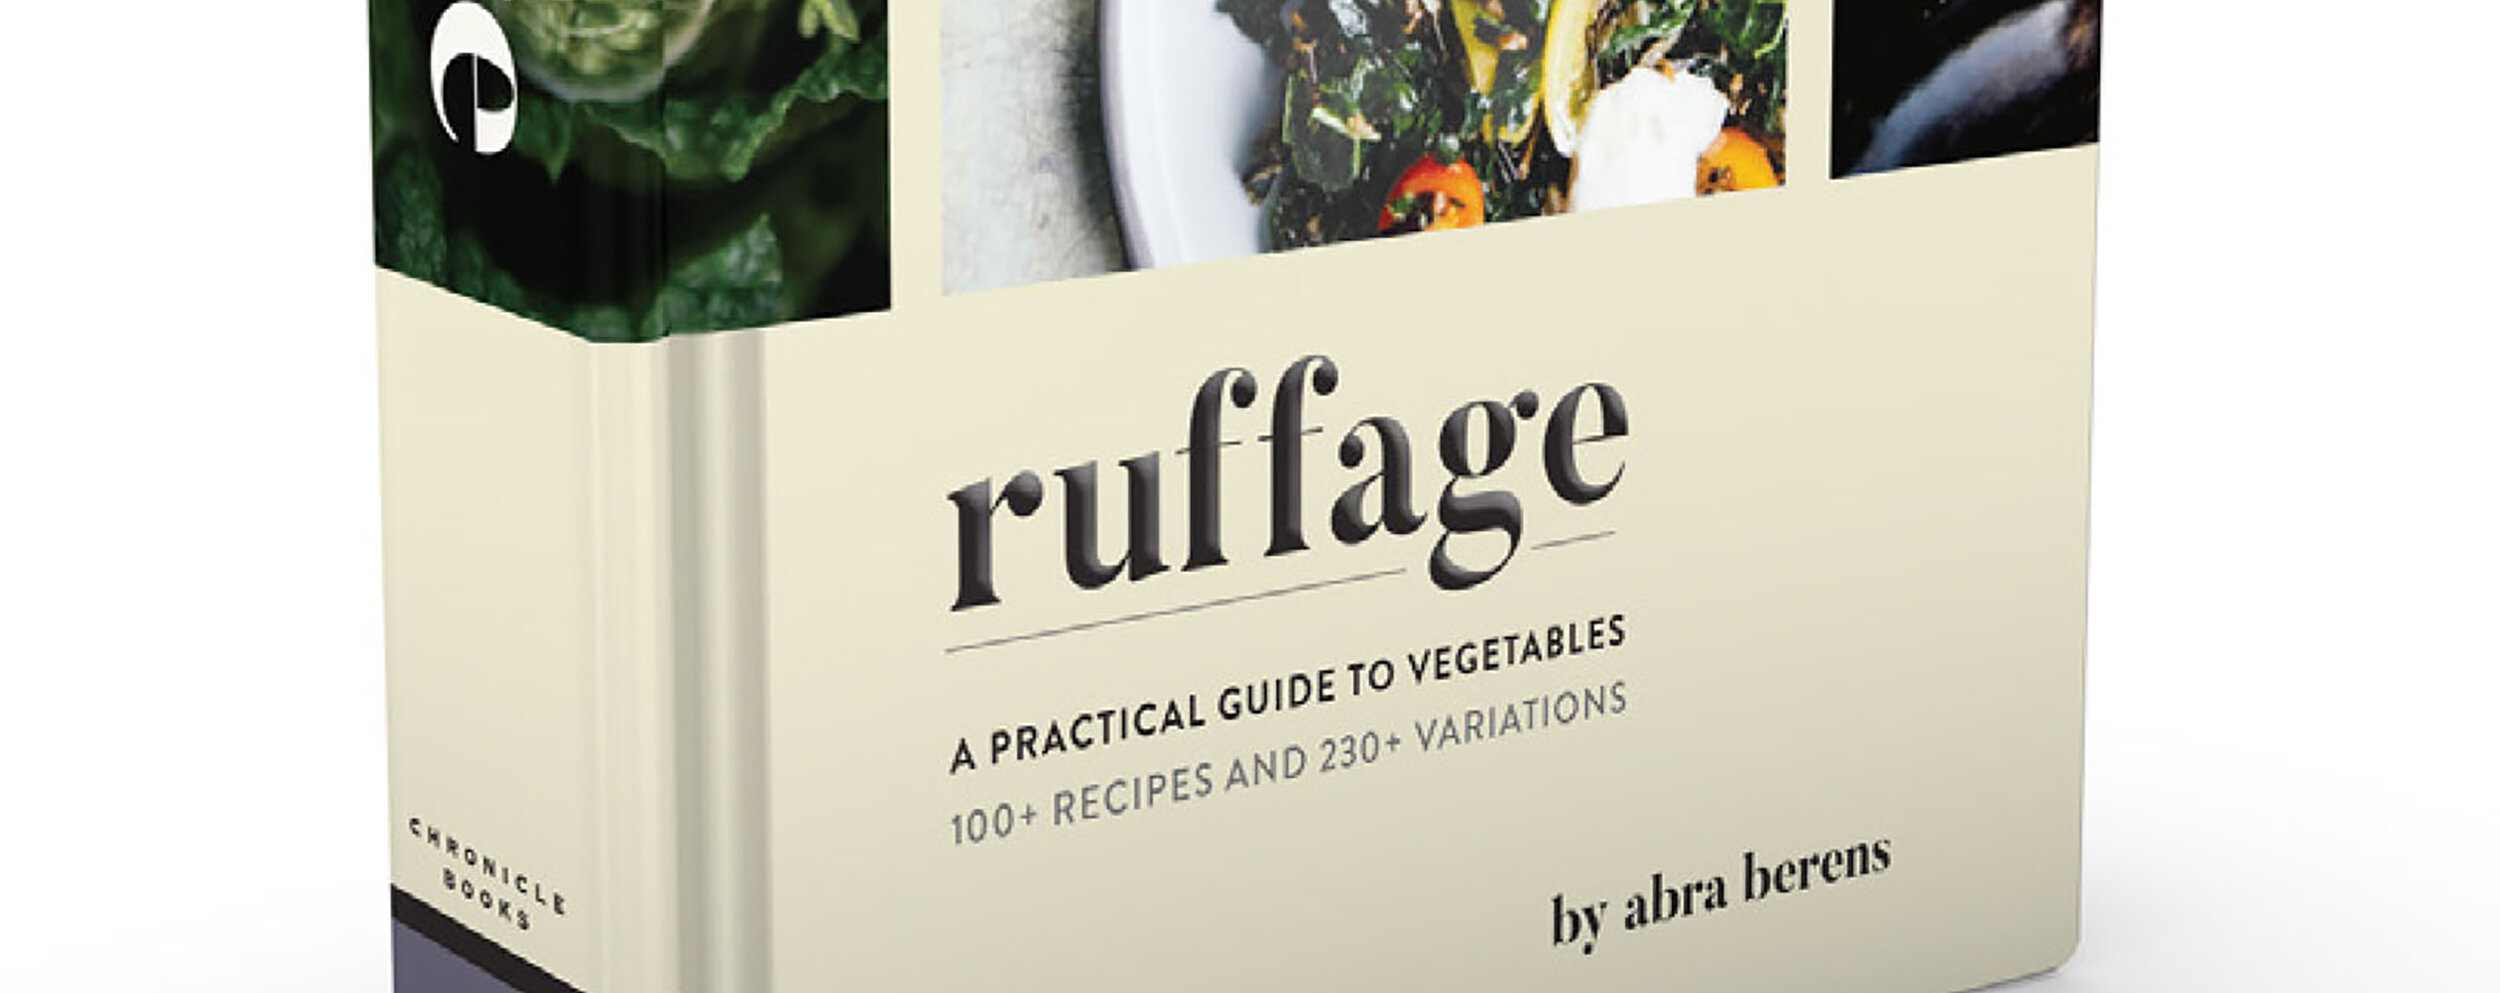 ruffage-angle-1600.jpg